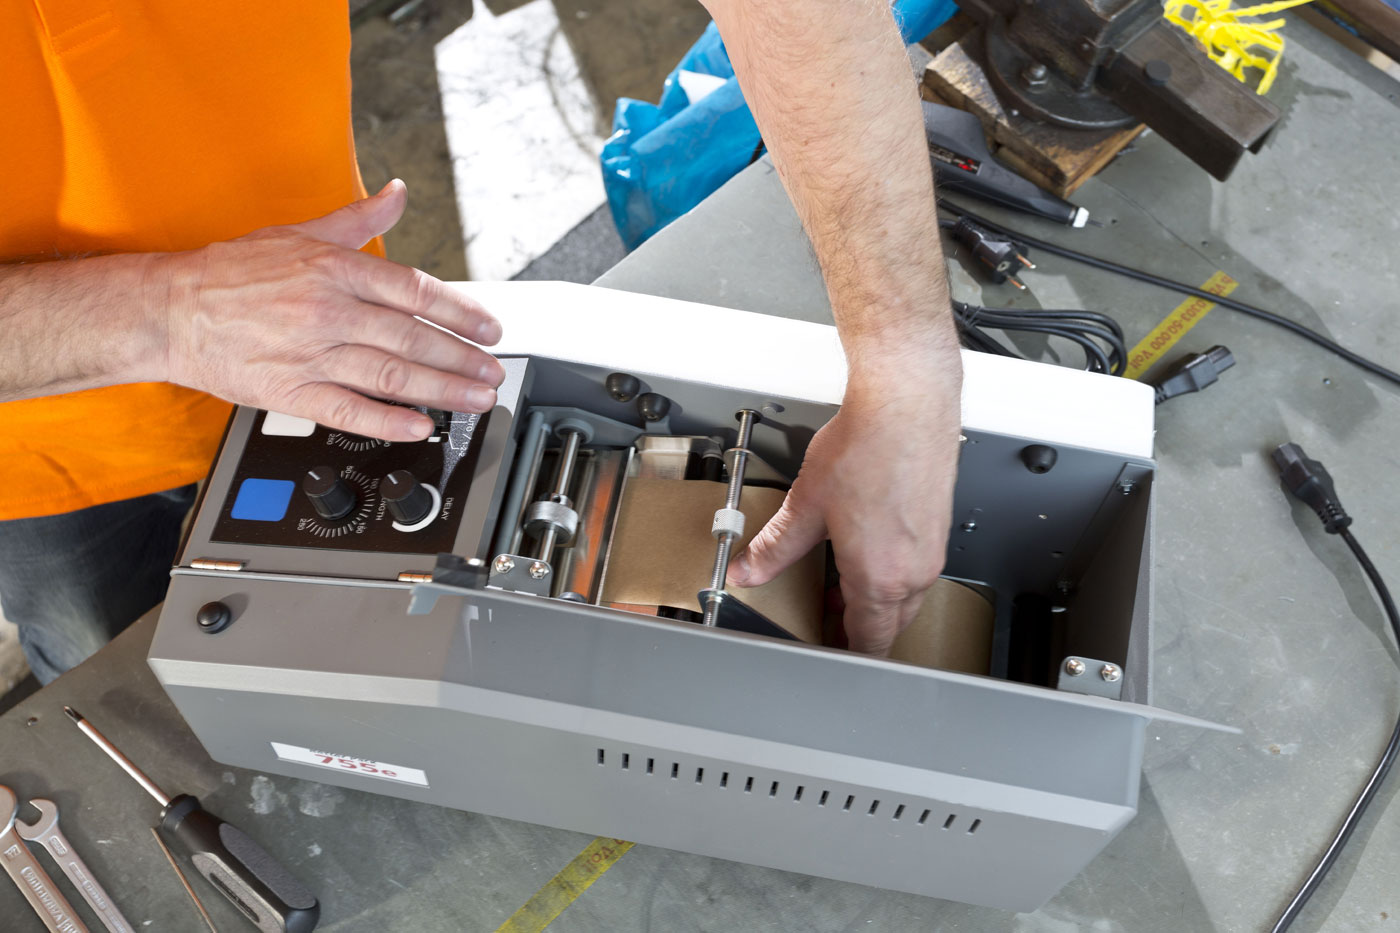 49fb99f2f39 Electronic Adhesive Tape Dispenser